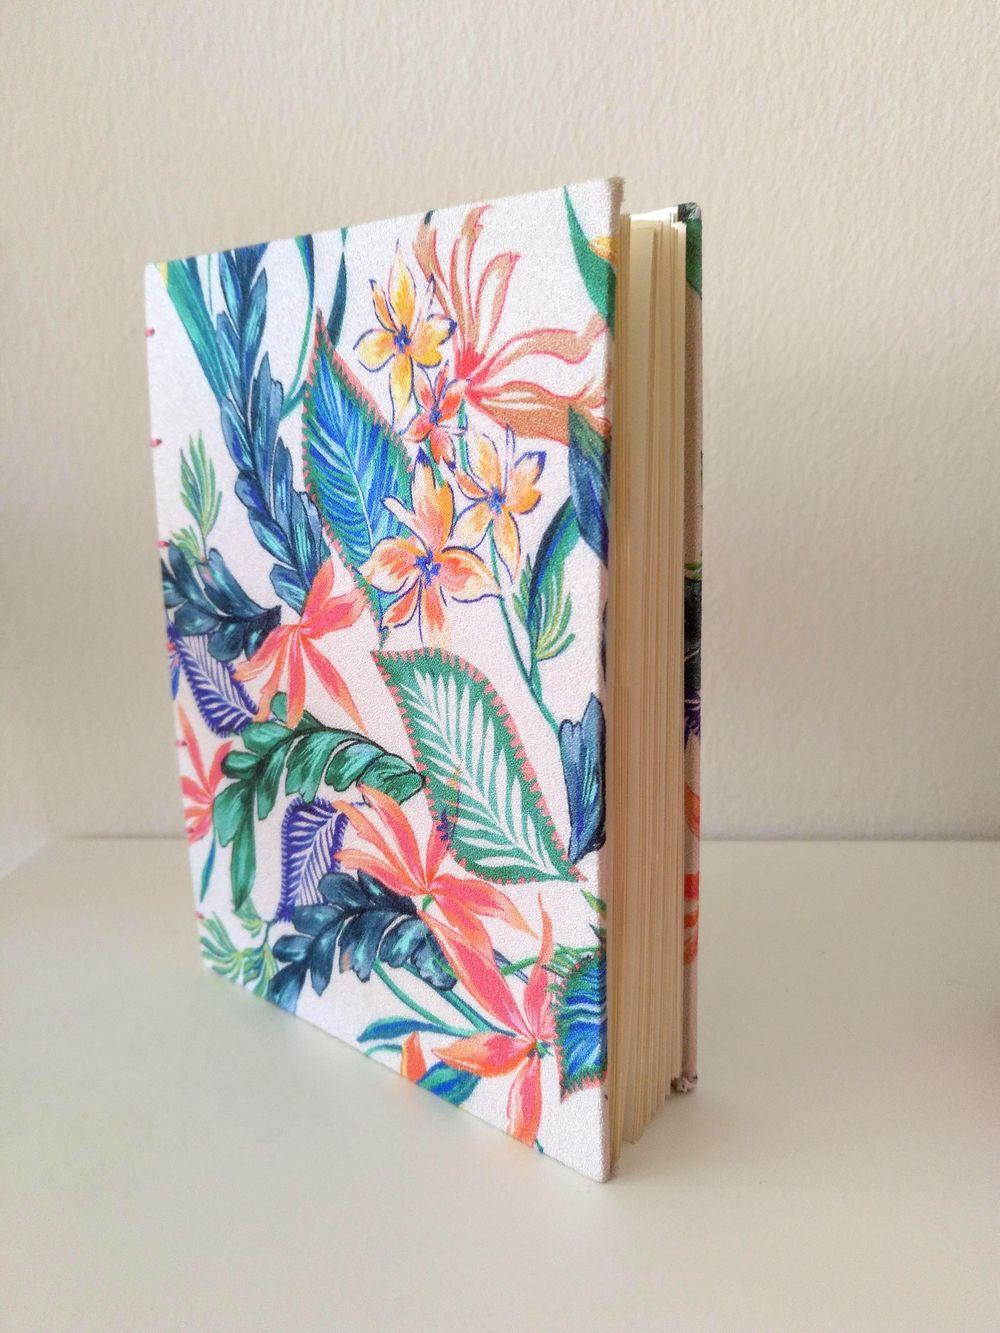 Coptic stitch sketchbook - image 2 - student project